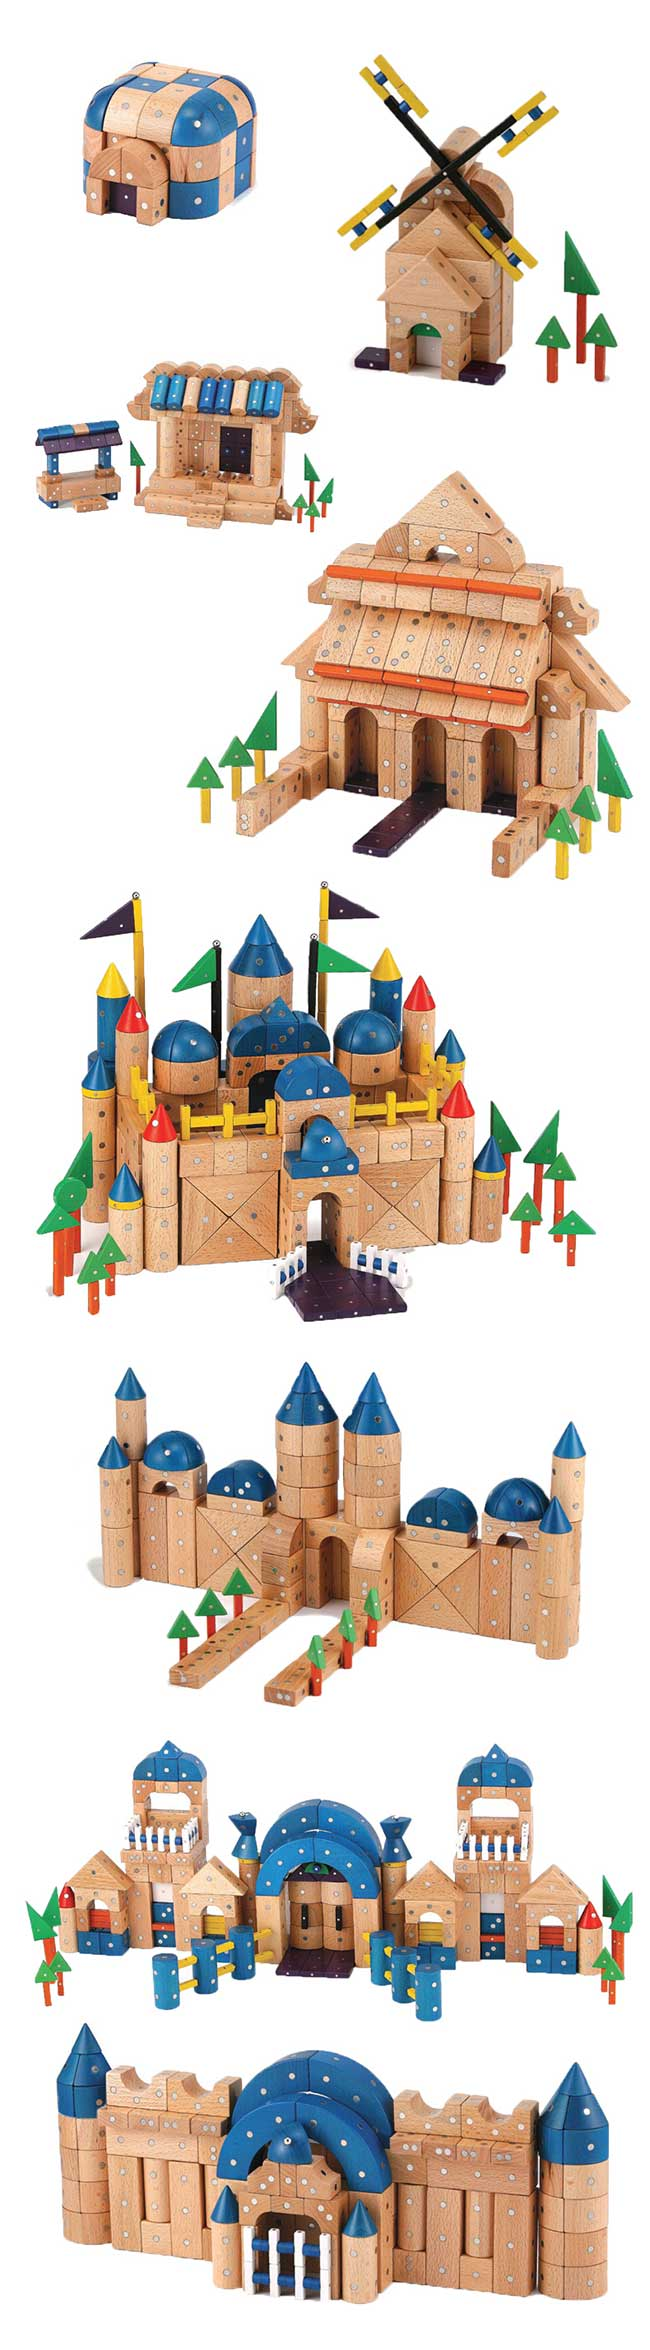 genii creation 智爱 创意磁铁积木拼搭组合 architecture 城堡 289